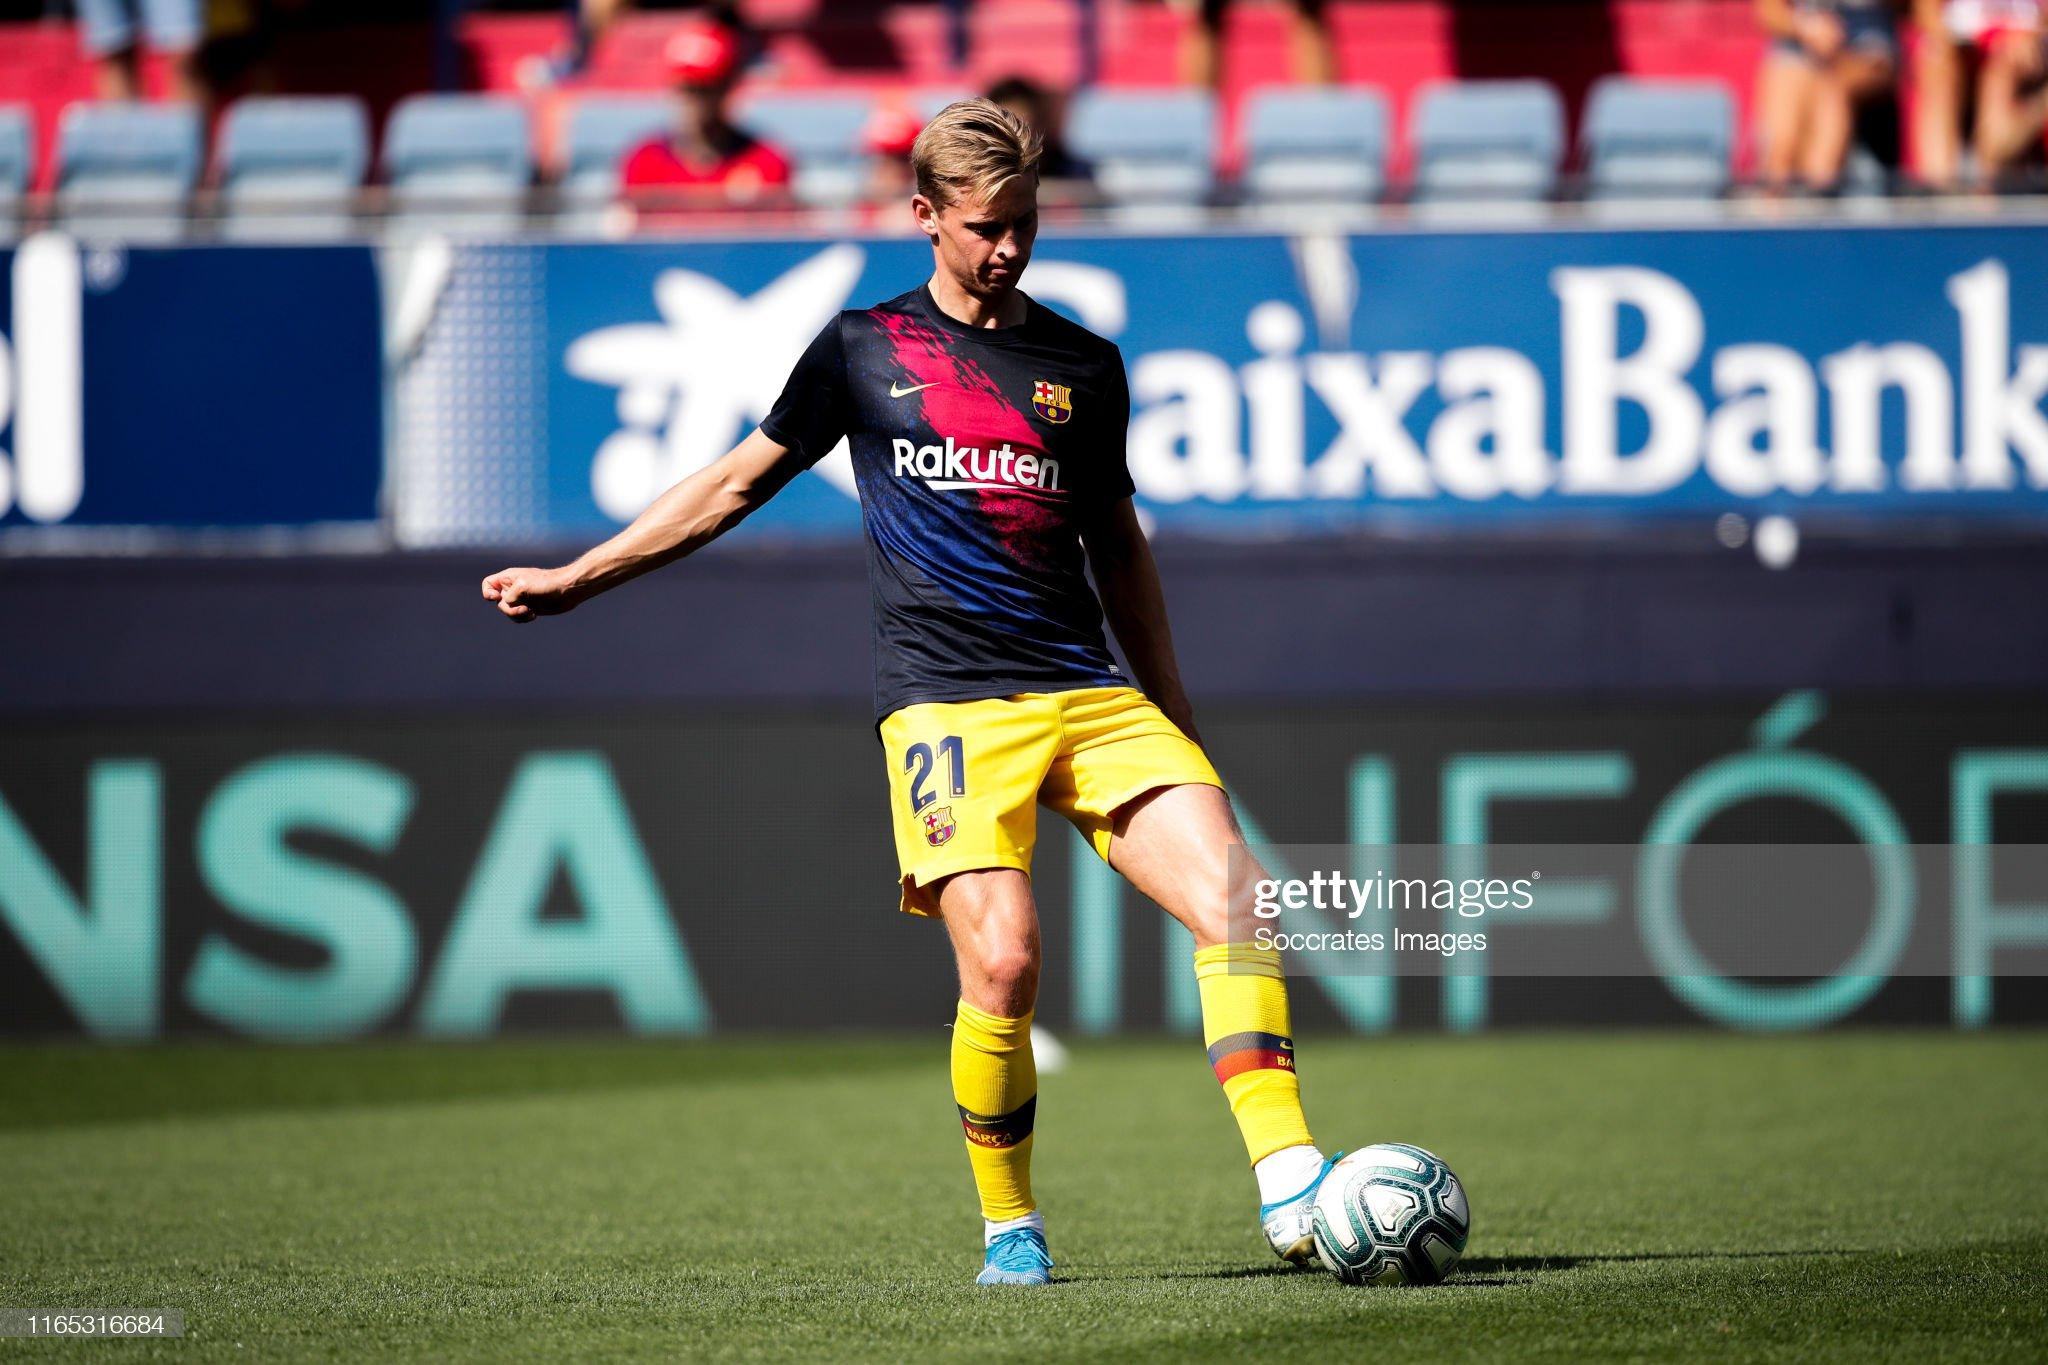 صور مباراة : أوساسونا - برشلونة 2-2 ( 31-08-2019 )  Frenkie-de-jong-of-fc-barcelona-during-the-la-liga-santander-match-picture-id1165316684?s=2048x2048